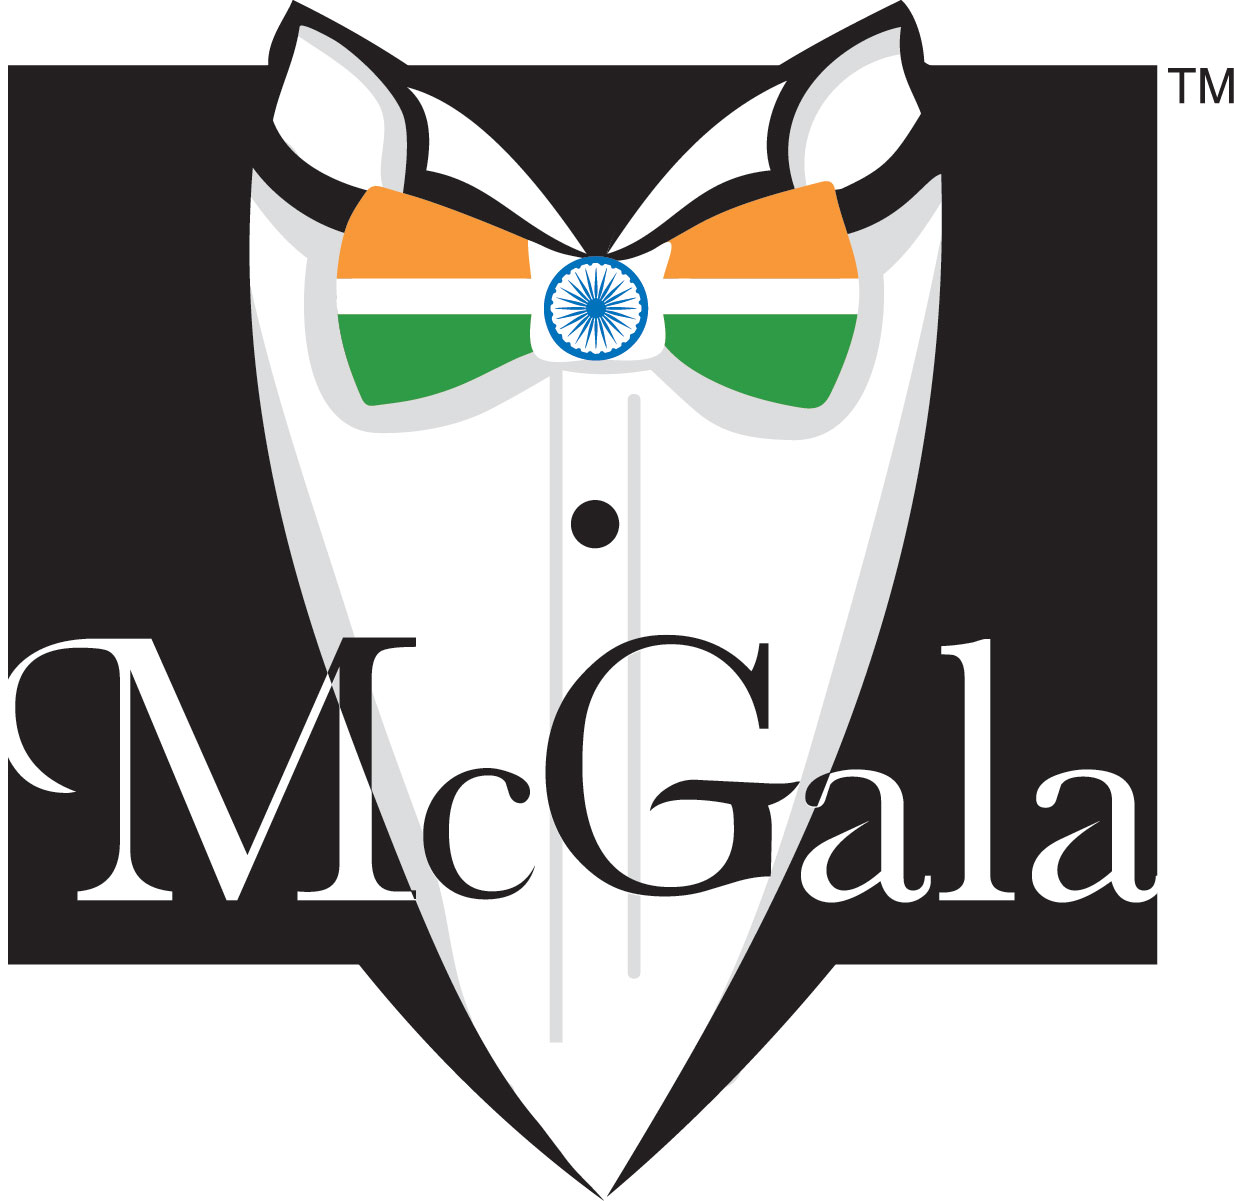 mcgala-logo-India-flag